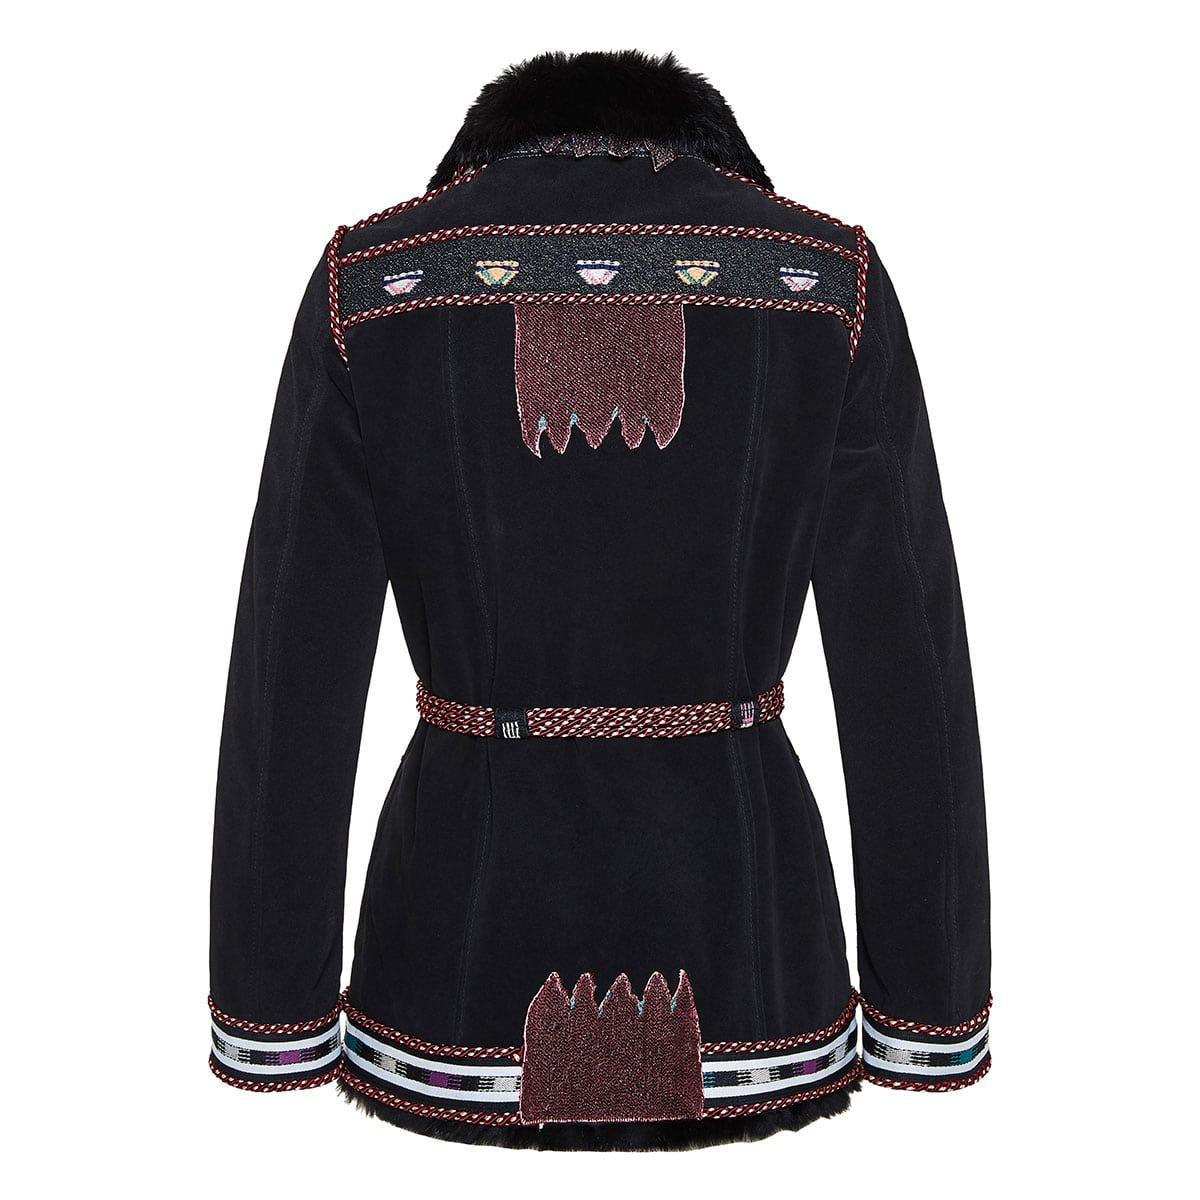 Fur-trimmed embroidered leather jacket